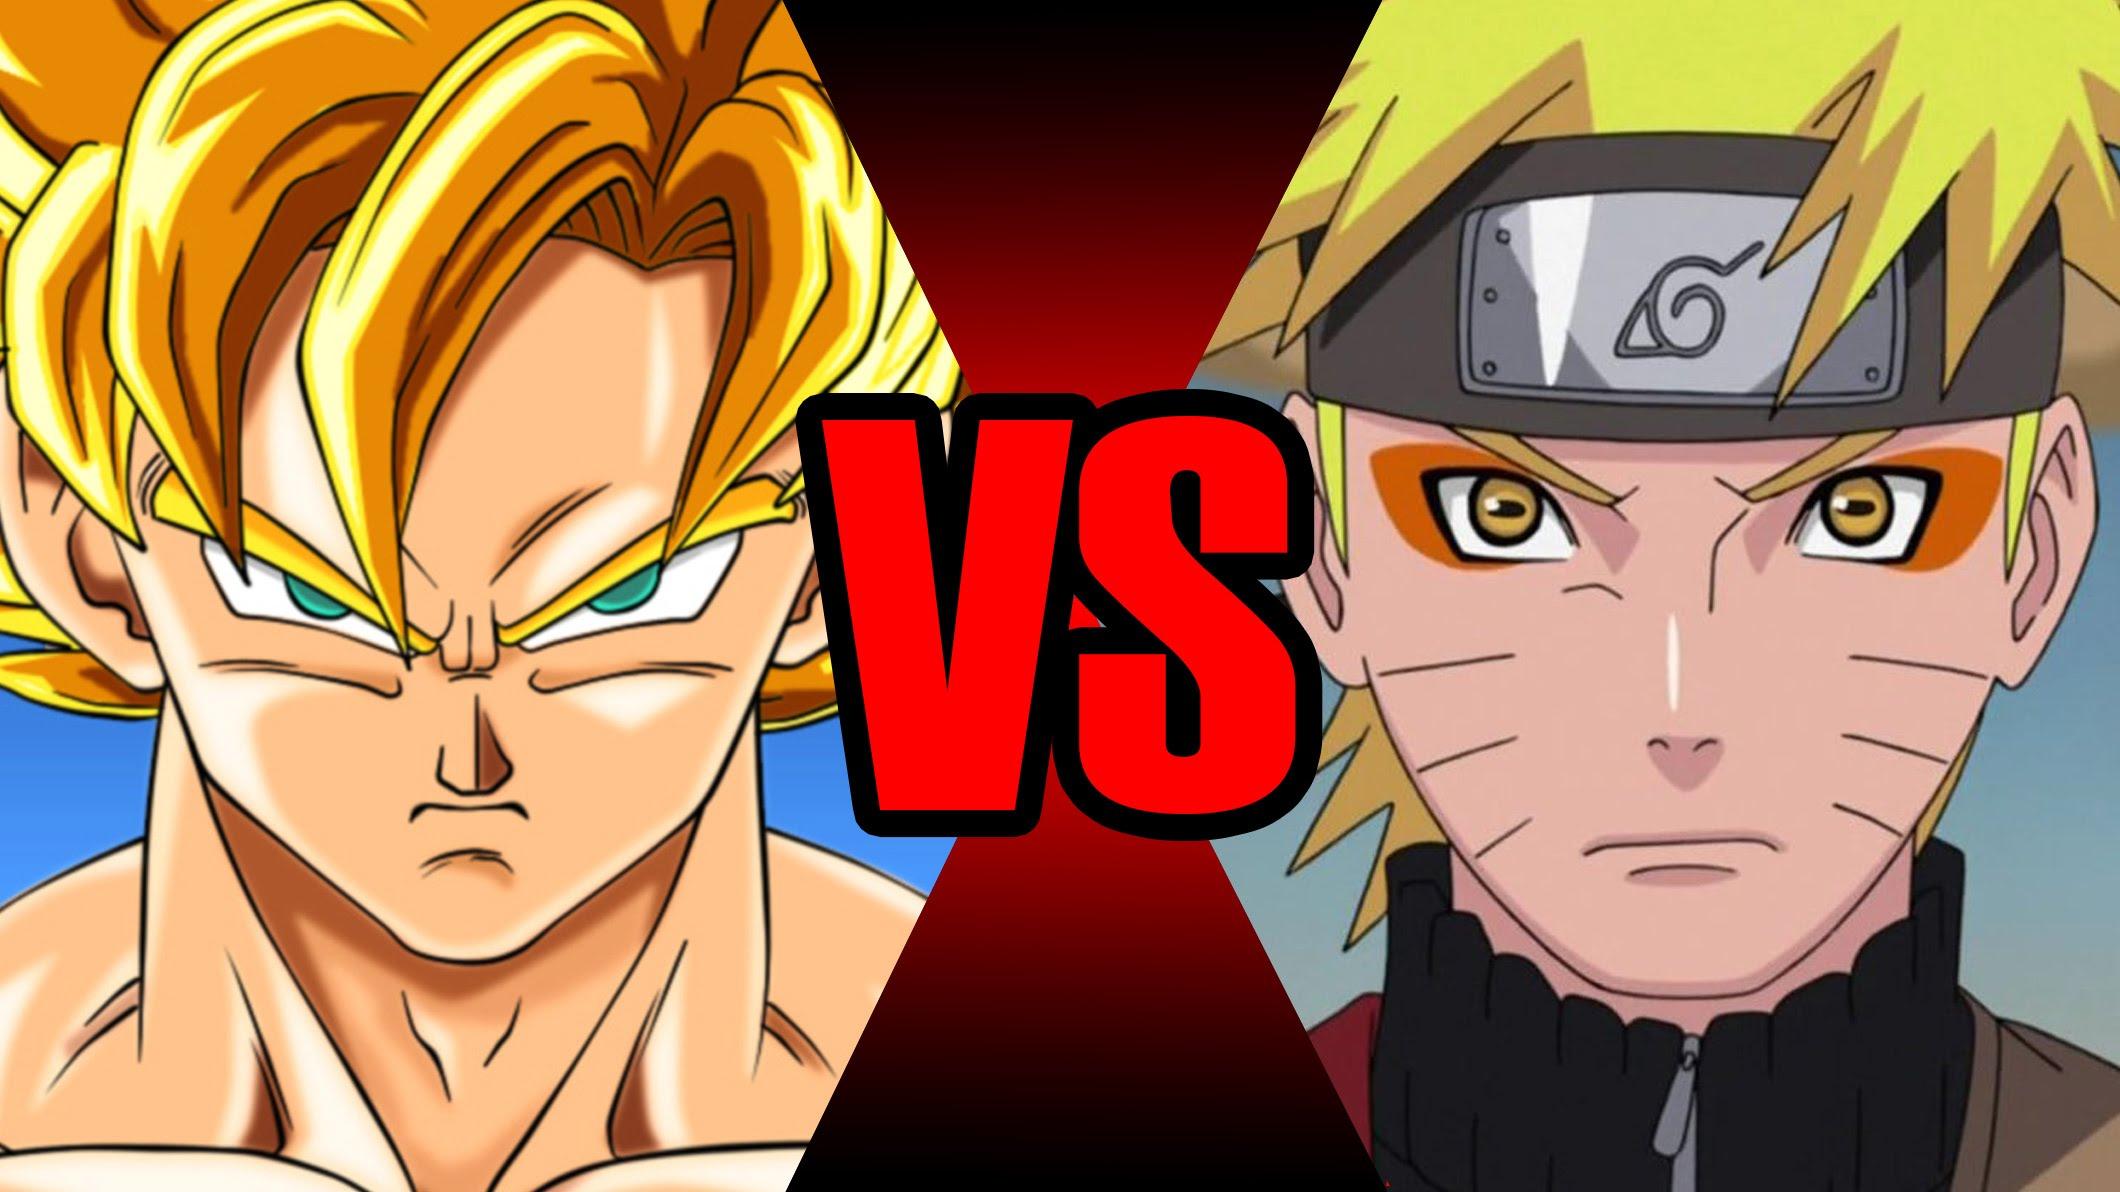 Dragonballz VS Naruto file - DragonballzVSNaruto - Mod DB